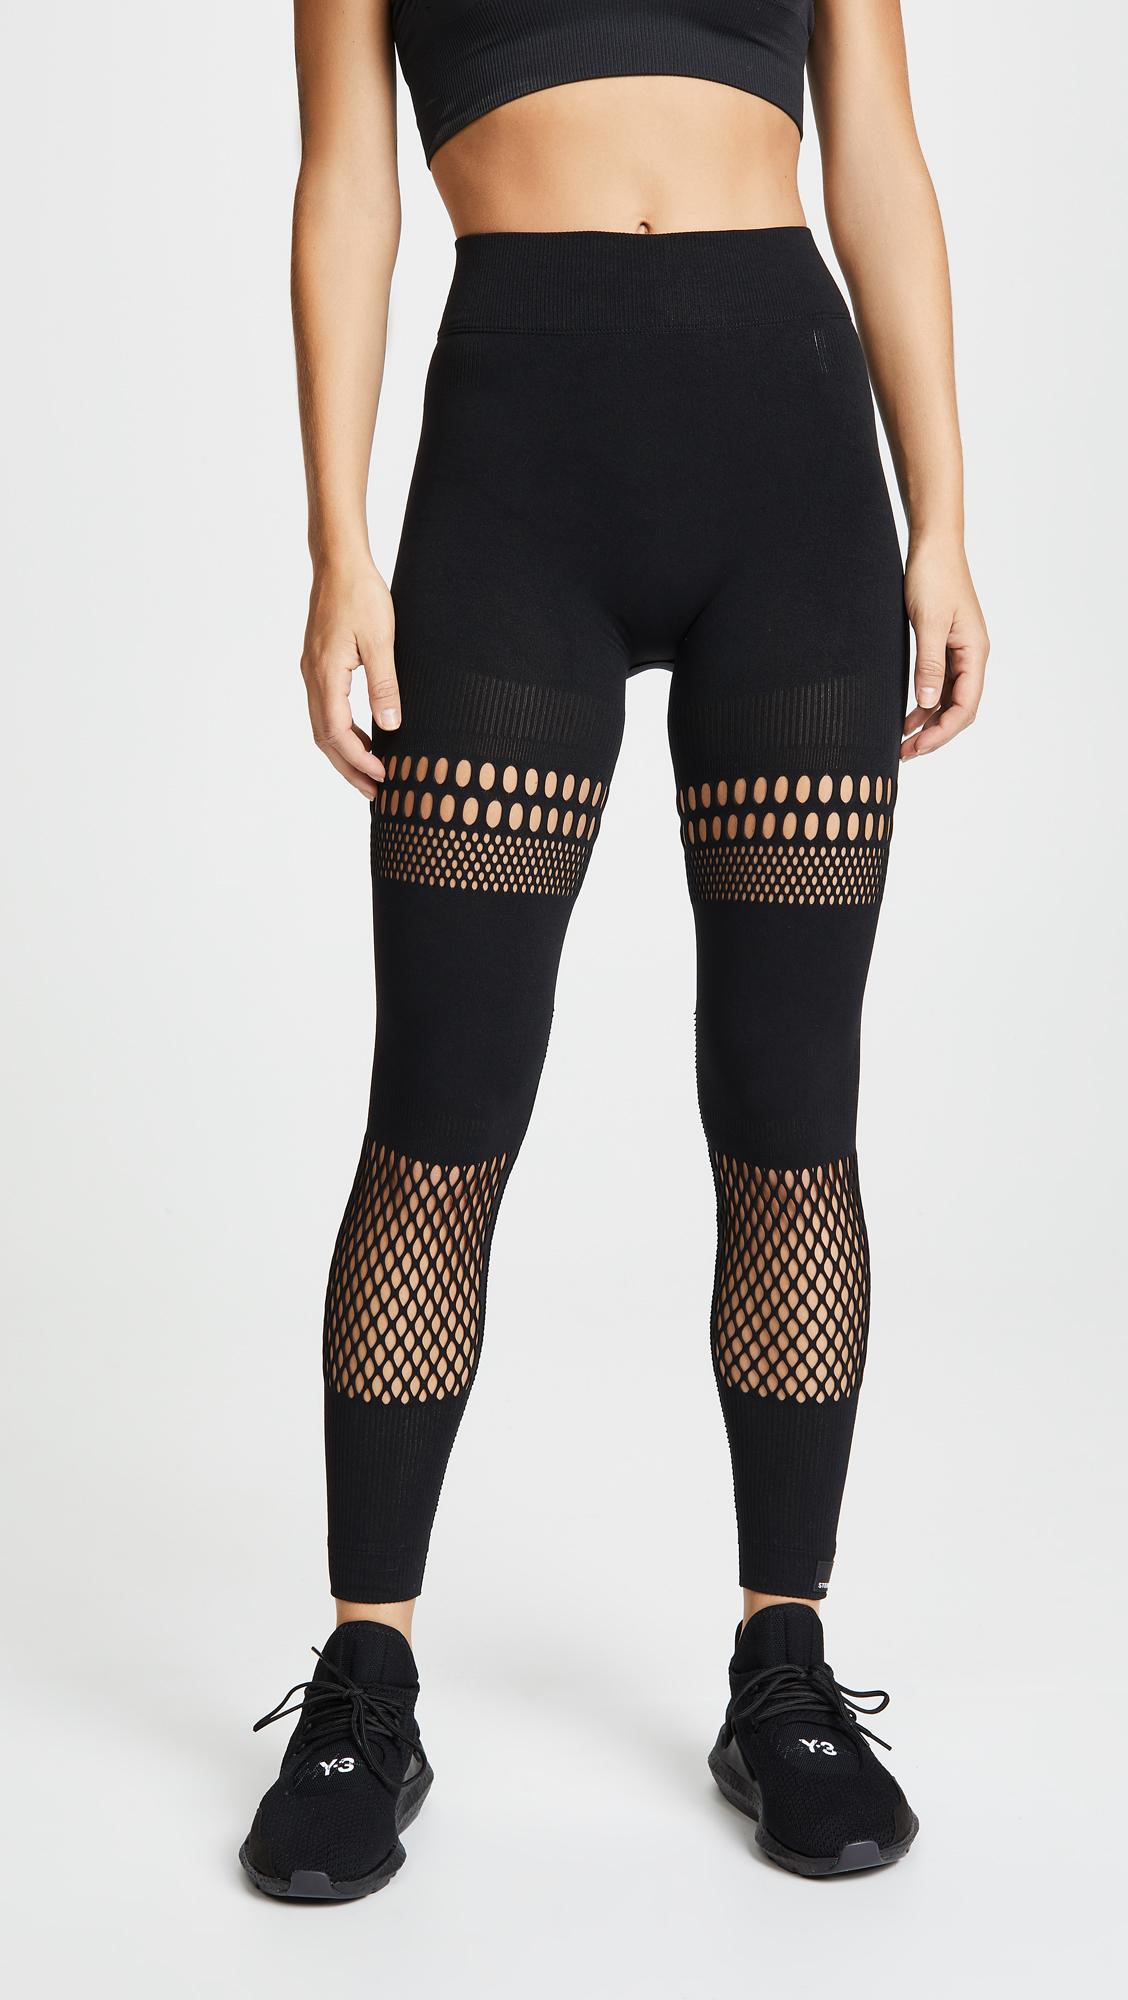 2e6b0b1e4fc38 adidas by Stella McCartney Yoga Warp Knit Leggings | SHOPBOP